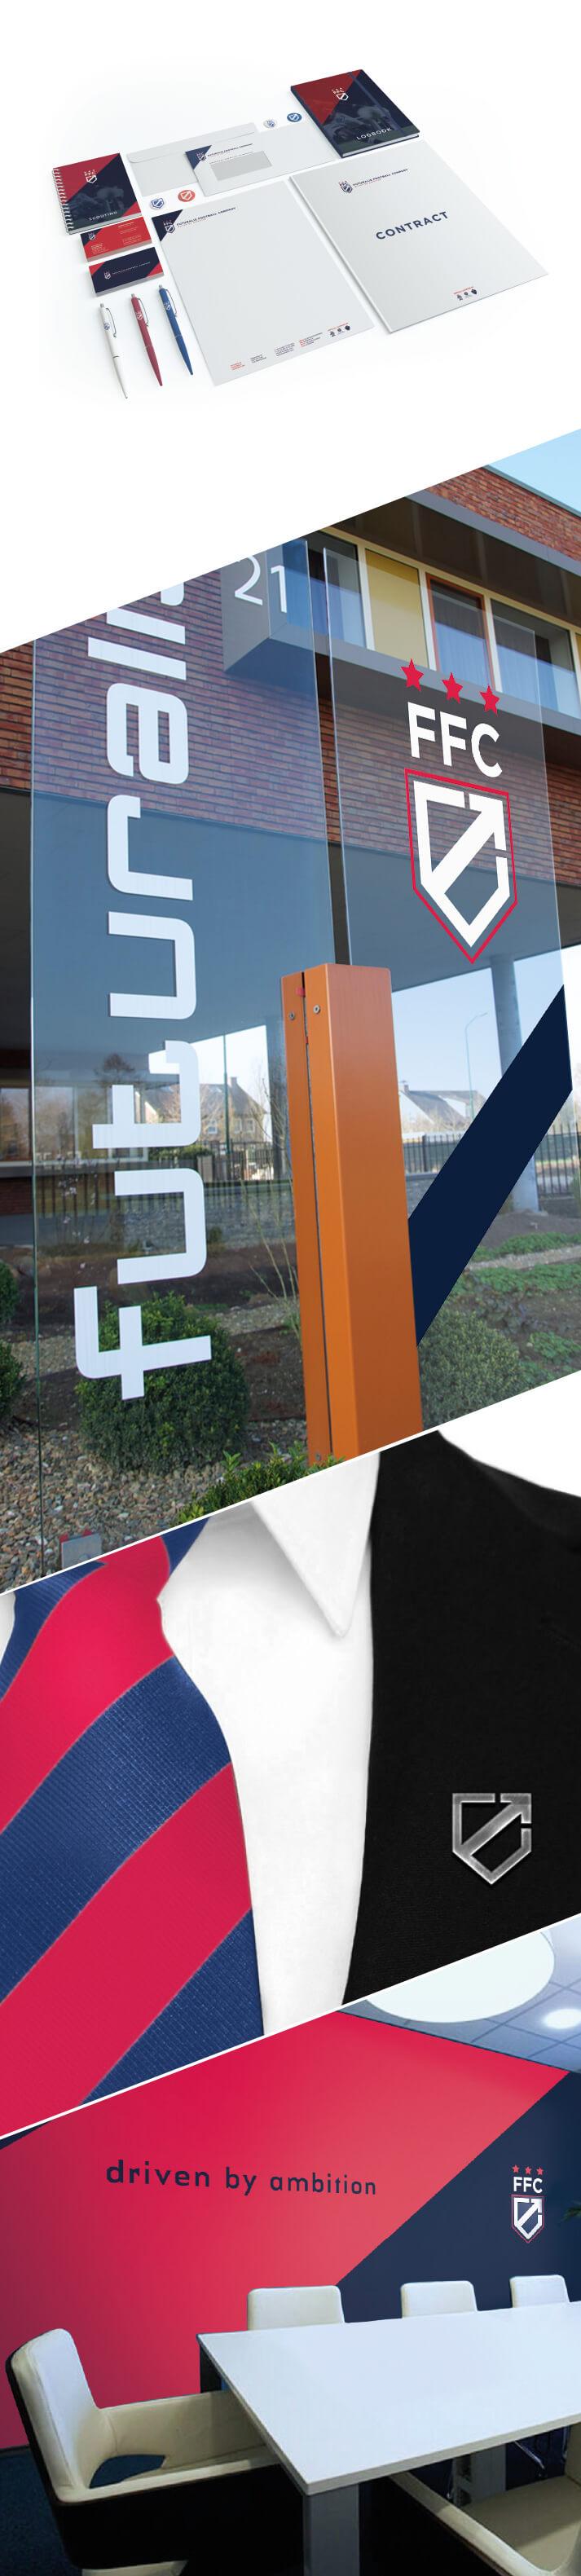 Futuralis Football Company corporate identity